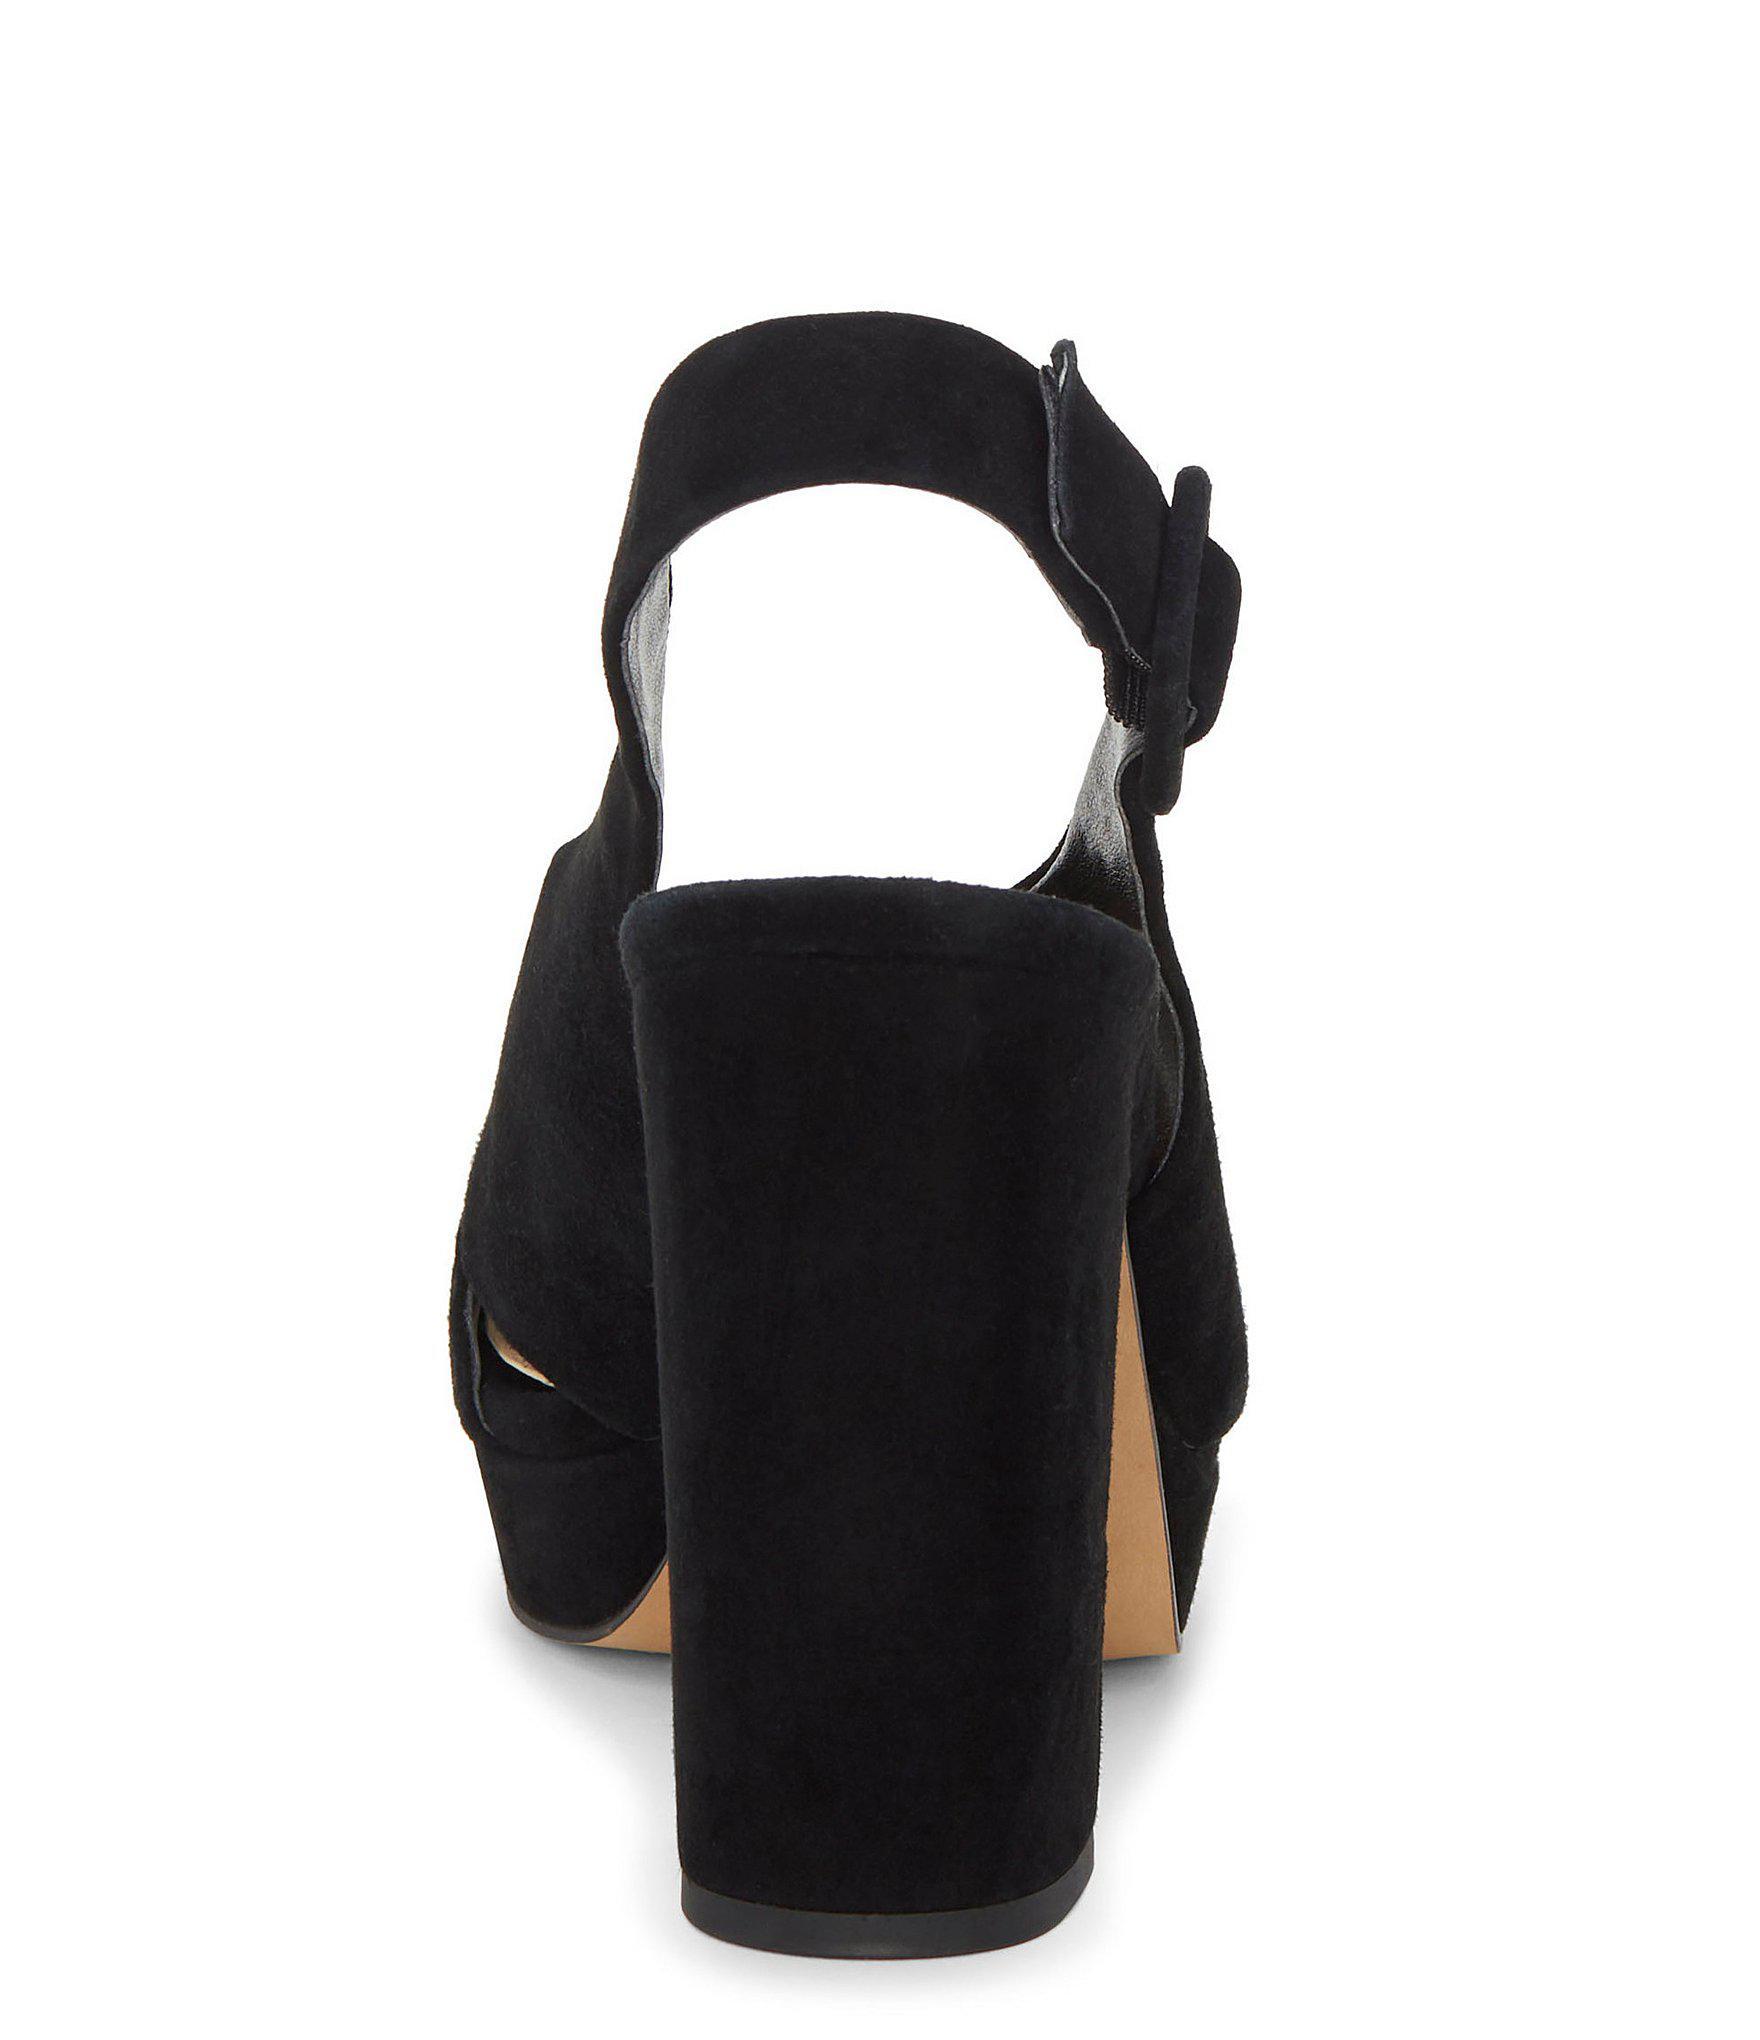 5a4f7b00979 Vince Camuto - Black Slingback Platform Sandal - Lyst. View fullscreen